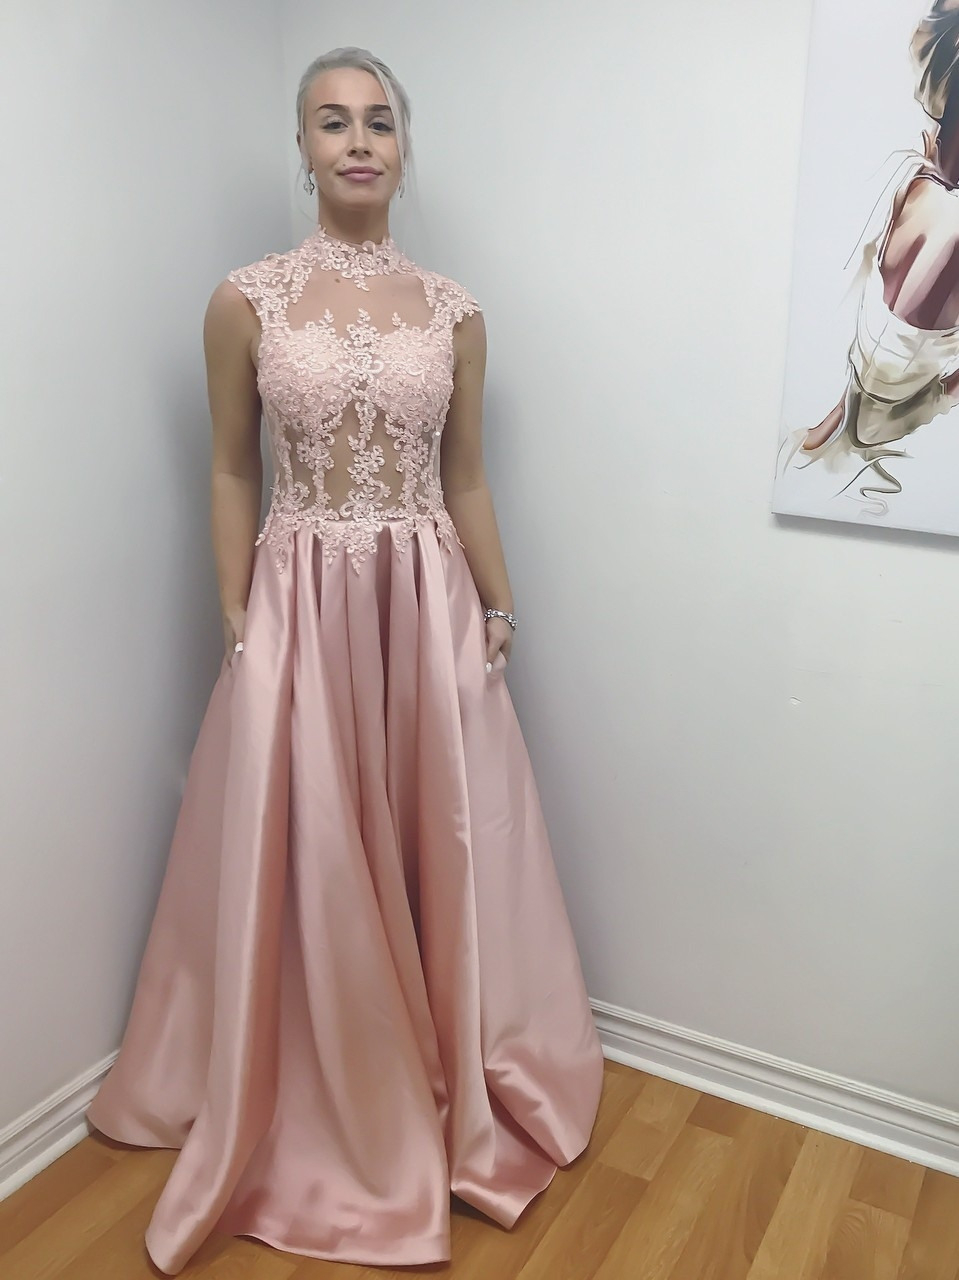 Designer Erstaunlich Abendkleid Elegant Lang VertriebDesigner Coolste Abendkleid Elegant Lang Spezialgebiet